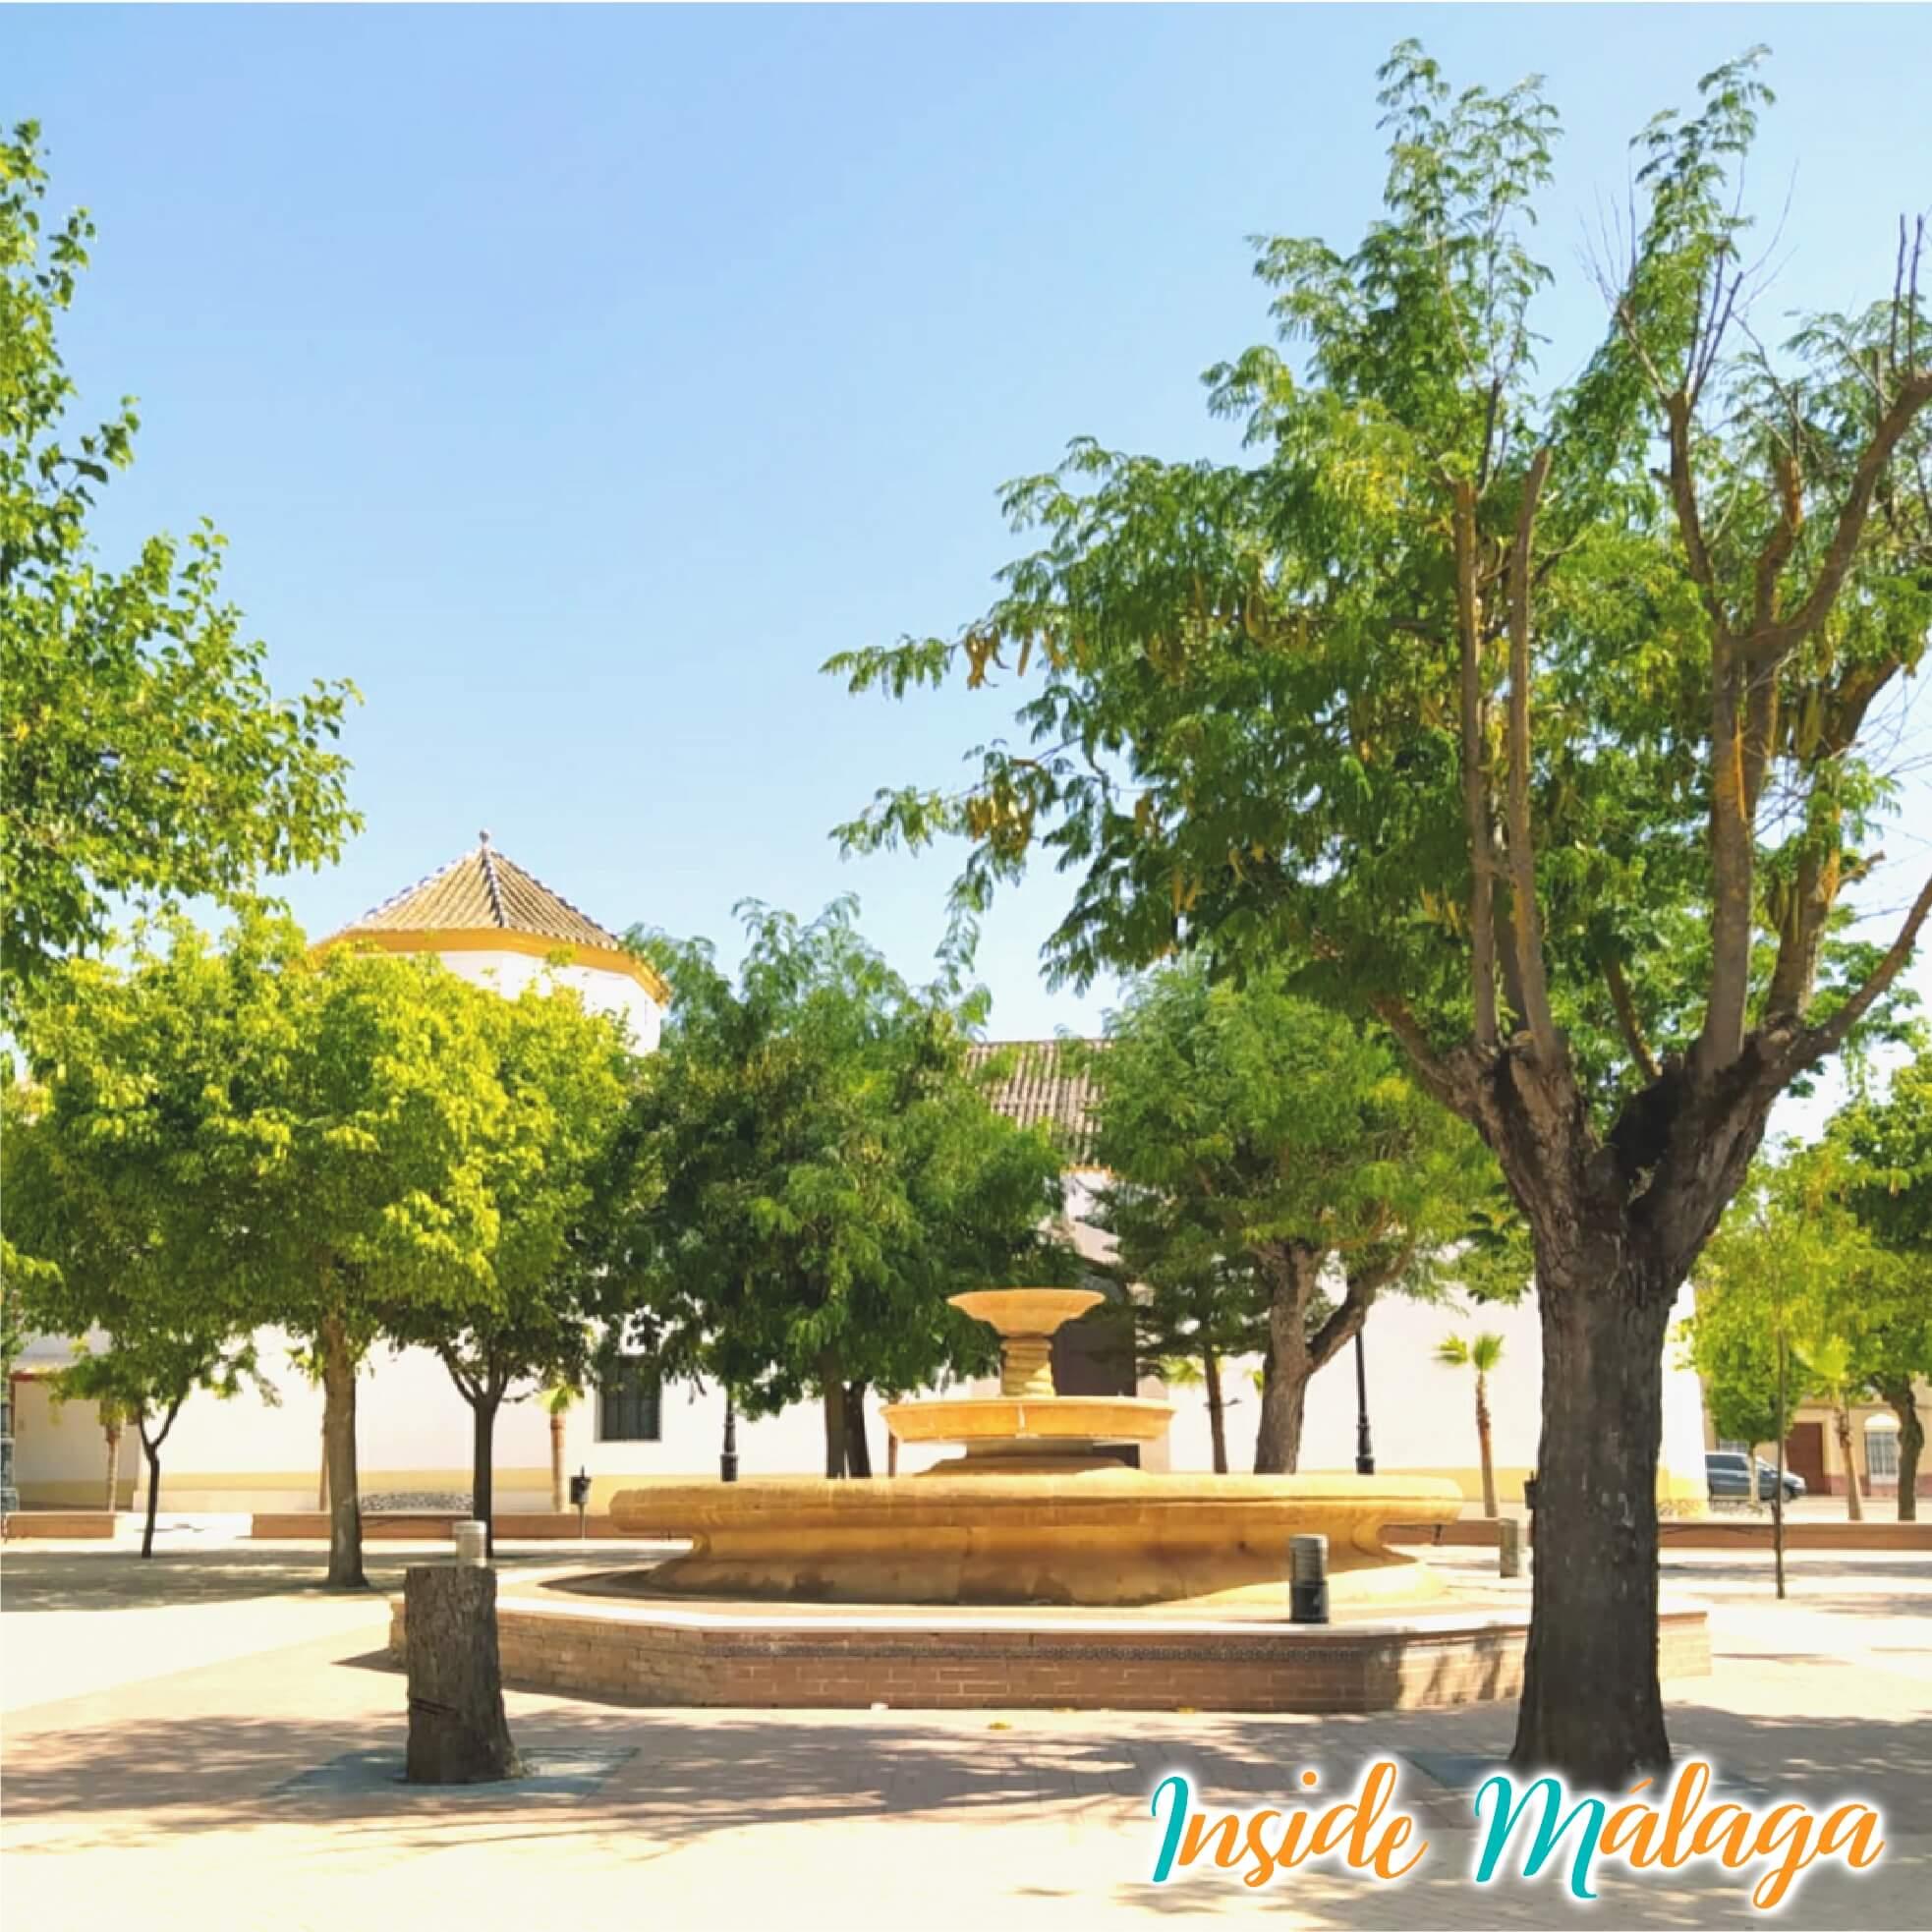 Plaza Andalucia Sierra de Yeguas Malaga